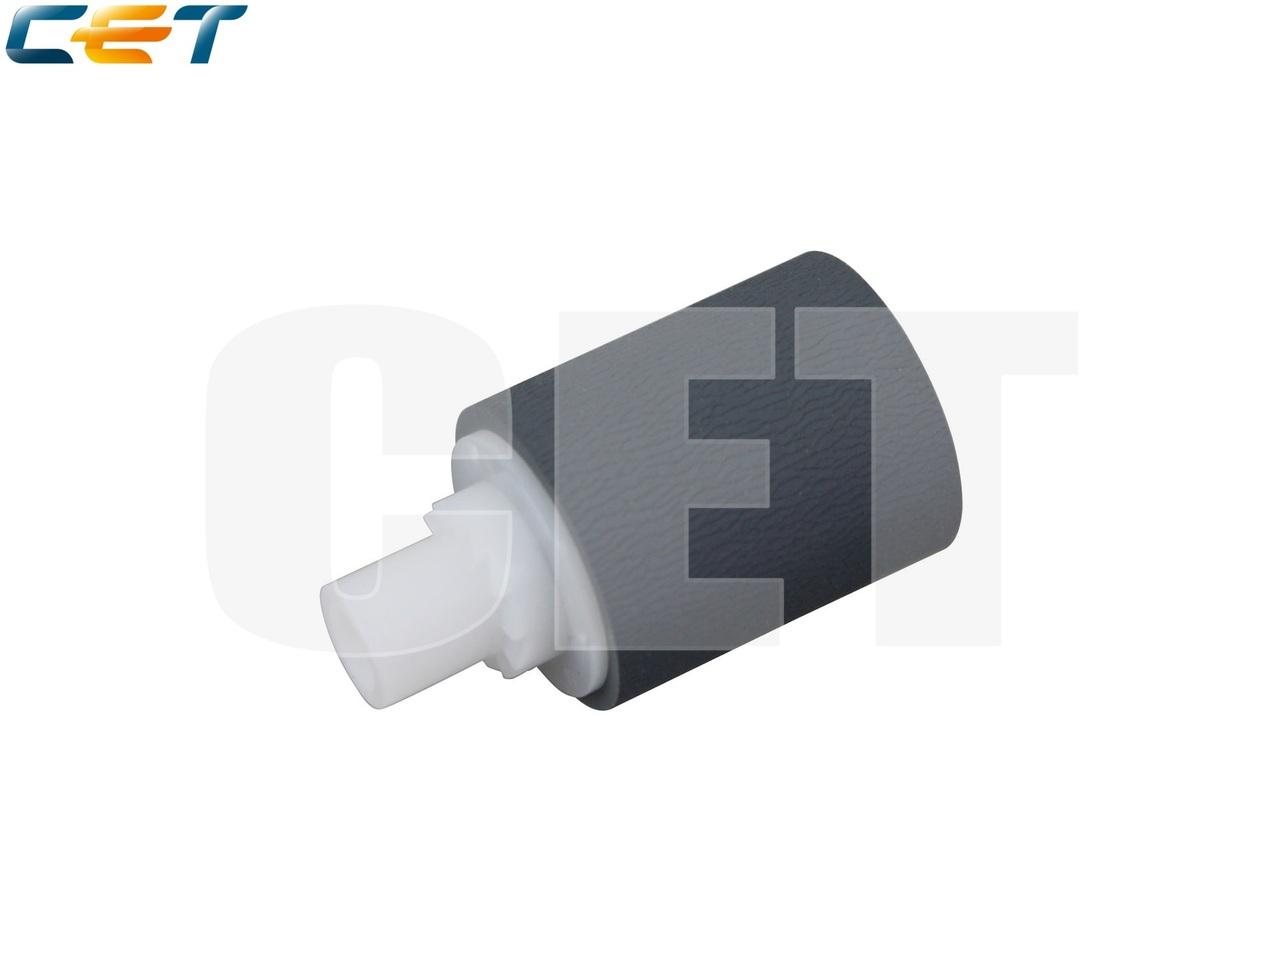 Ролик подхвата ADF B802-4361 для RICOH AficioMP4000/MP5000/MP4000B/MP5000B (CET), CET6081